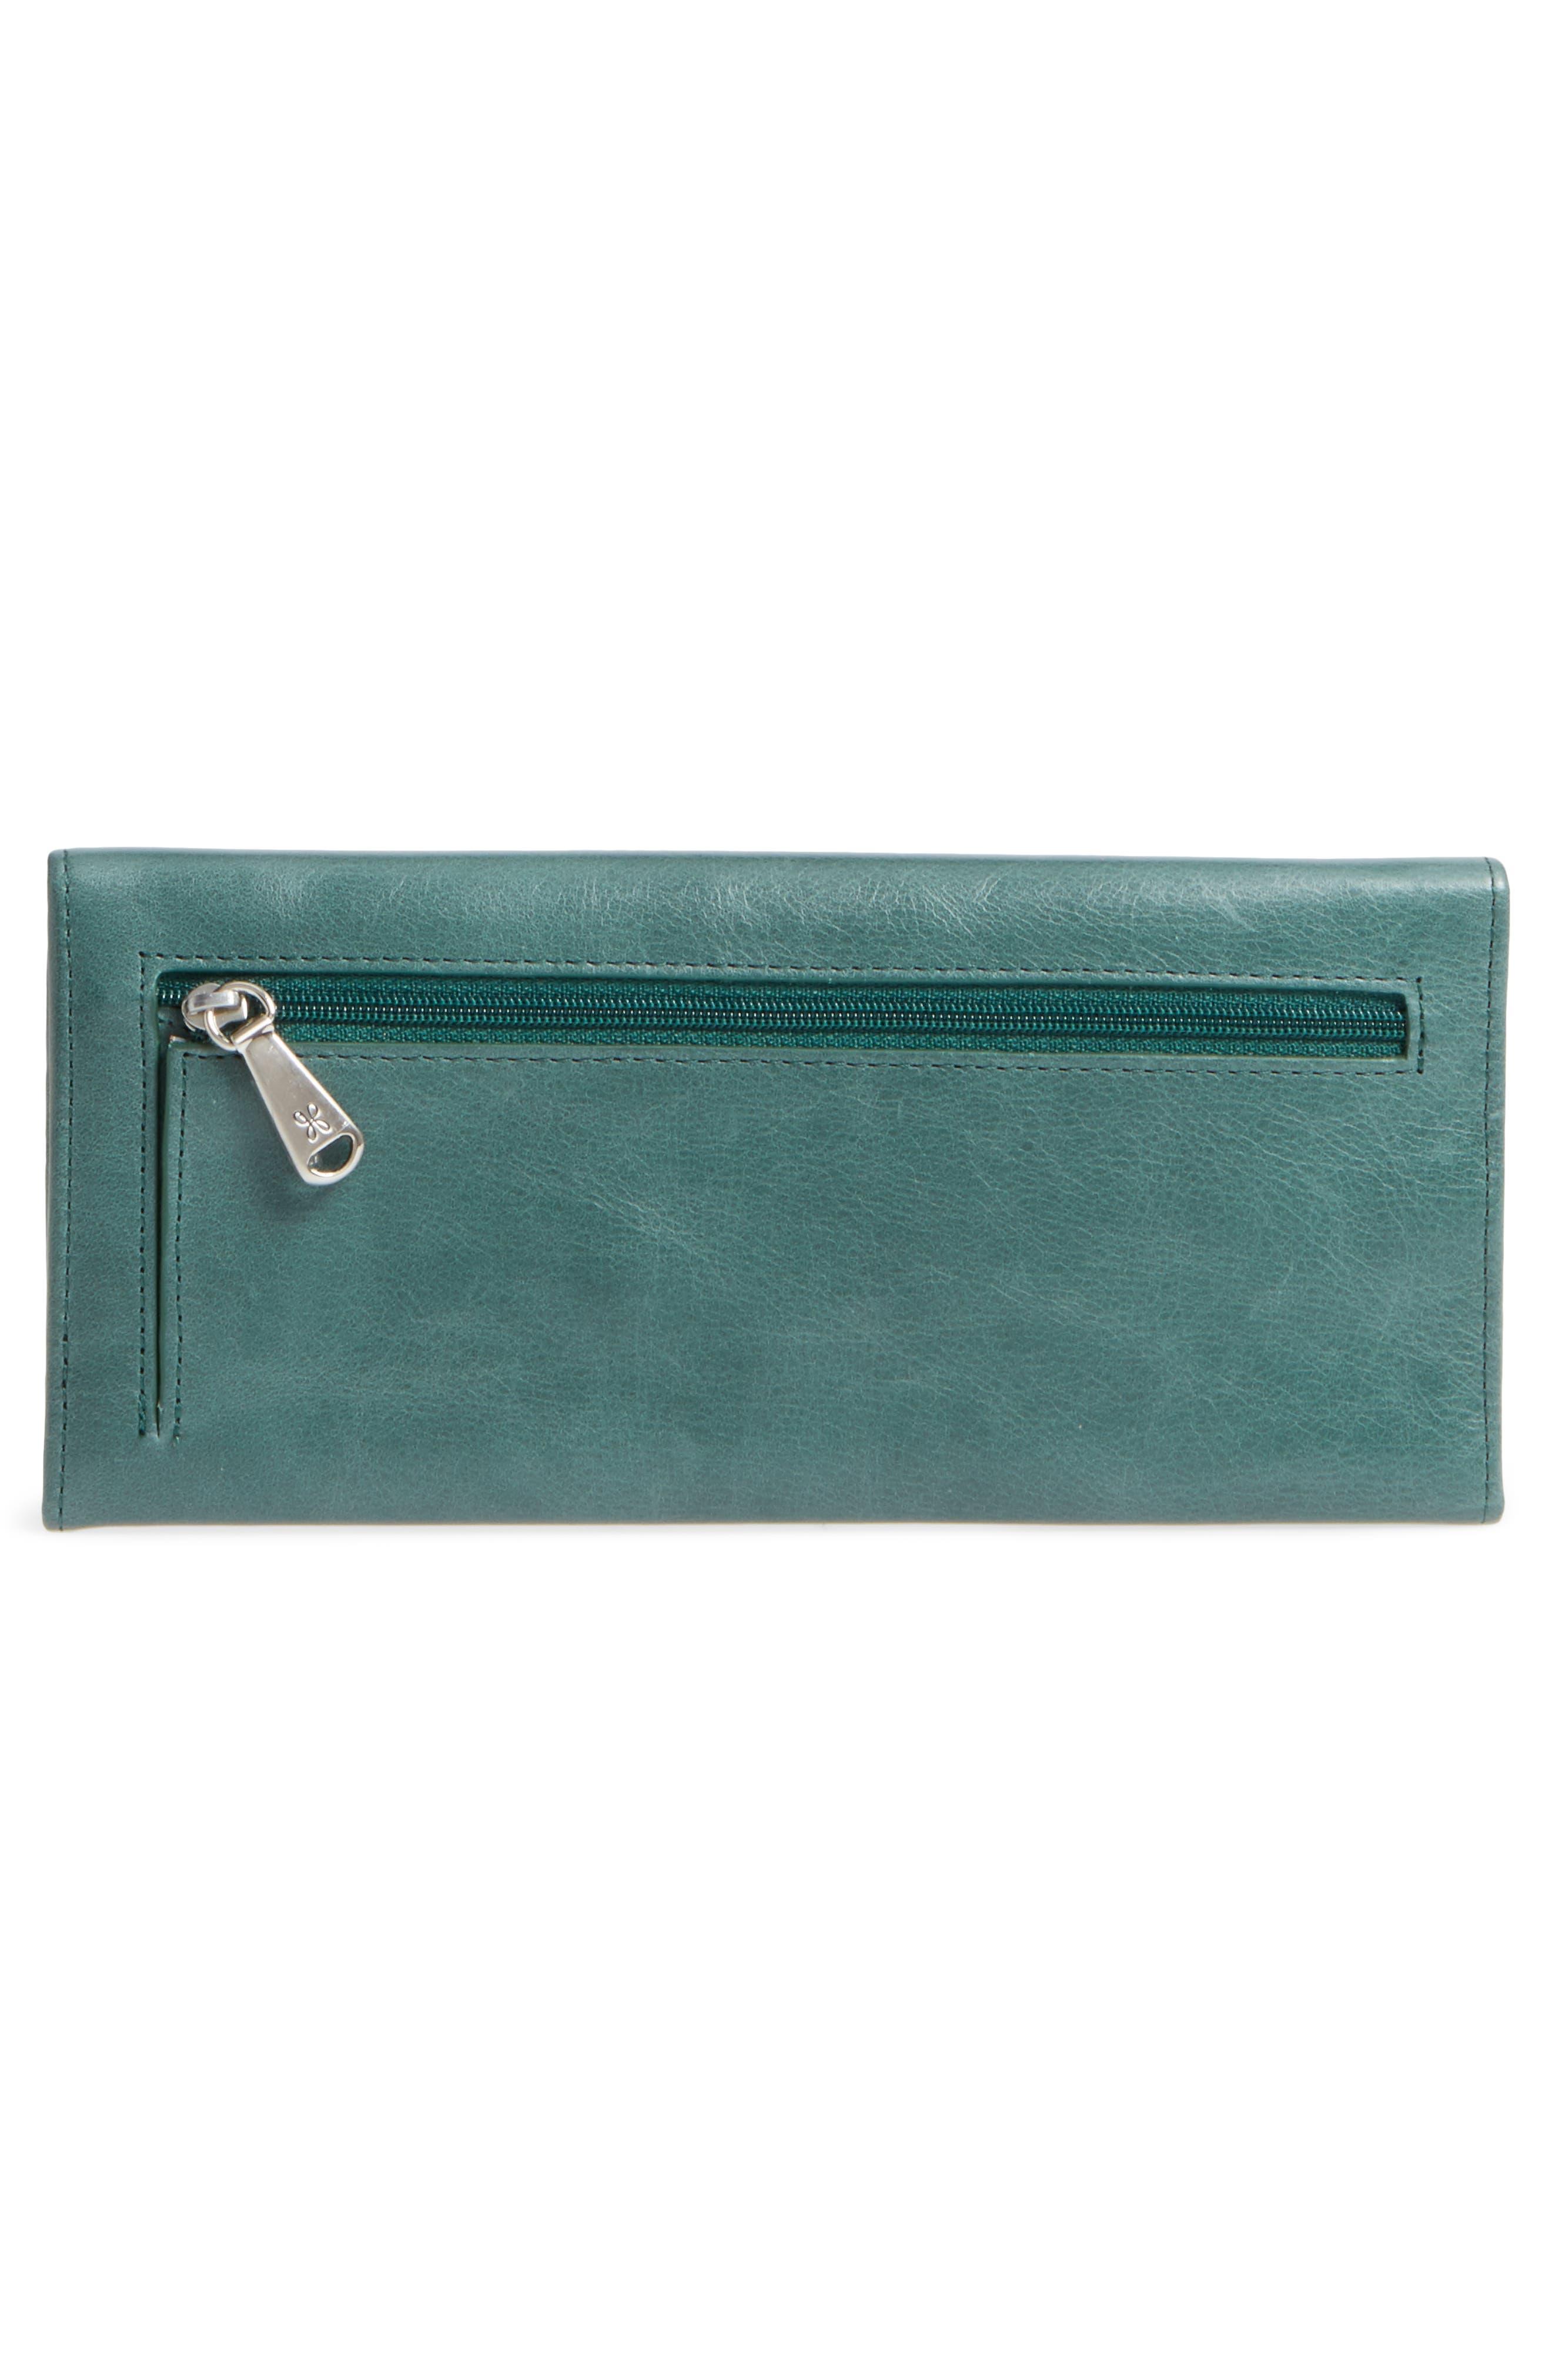 'Sadie' Leather Wallet,                             Alternate thumbnail 107, color,